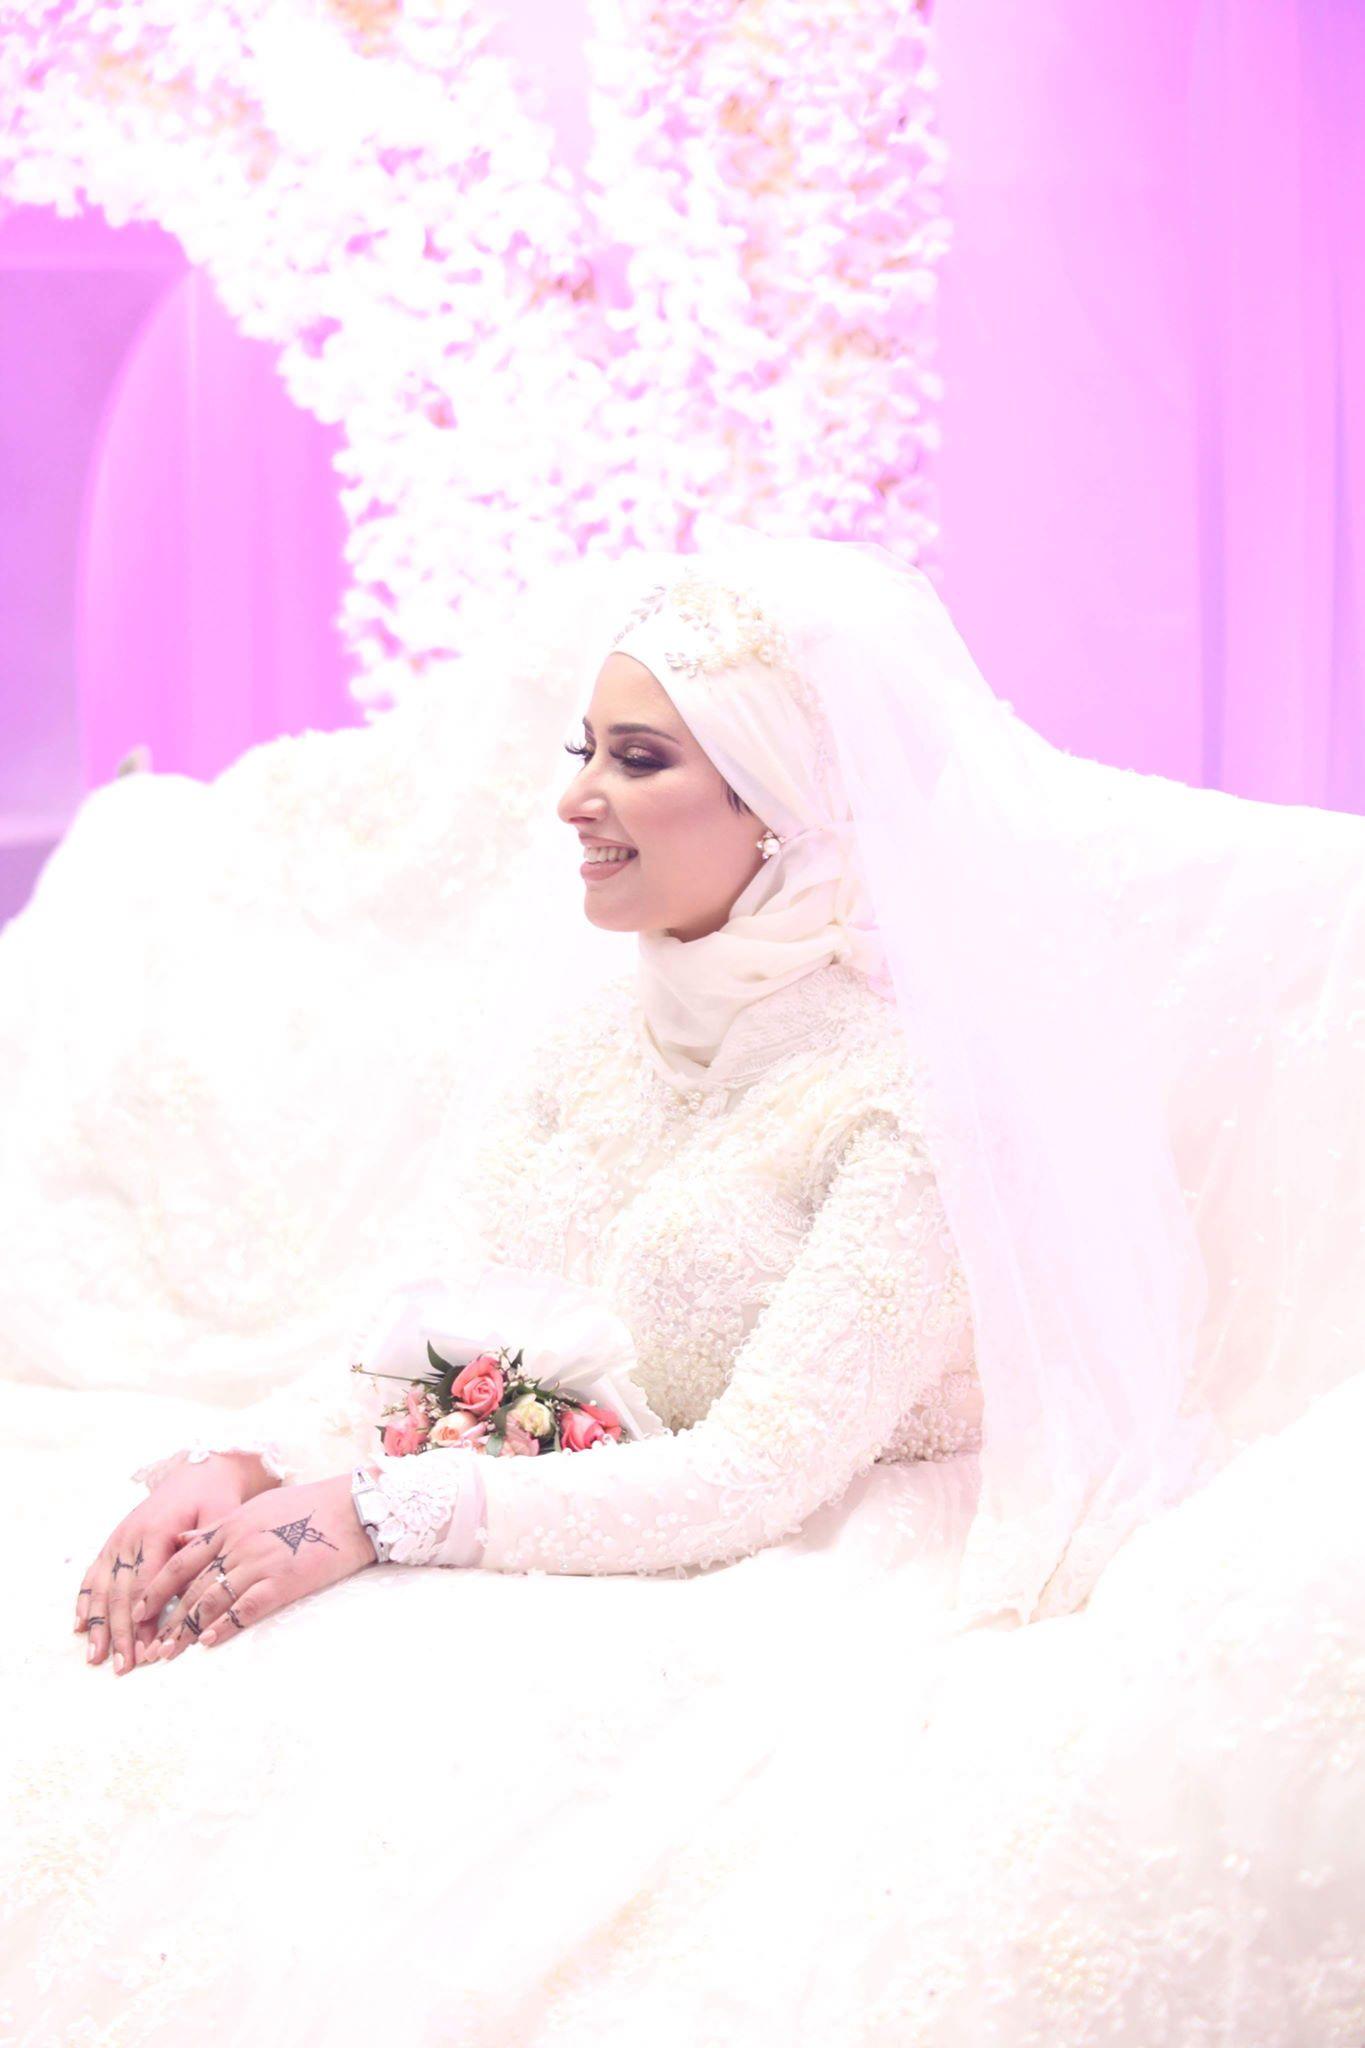 Tesnim_M9_plus_belles_mariées_tunisiennes2019